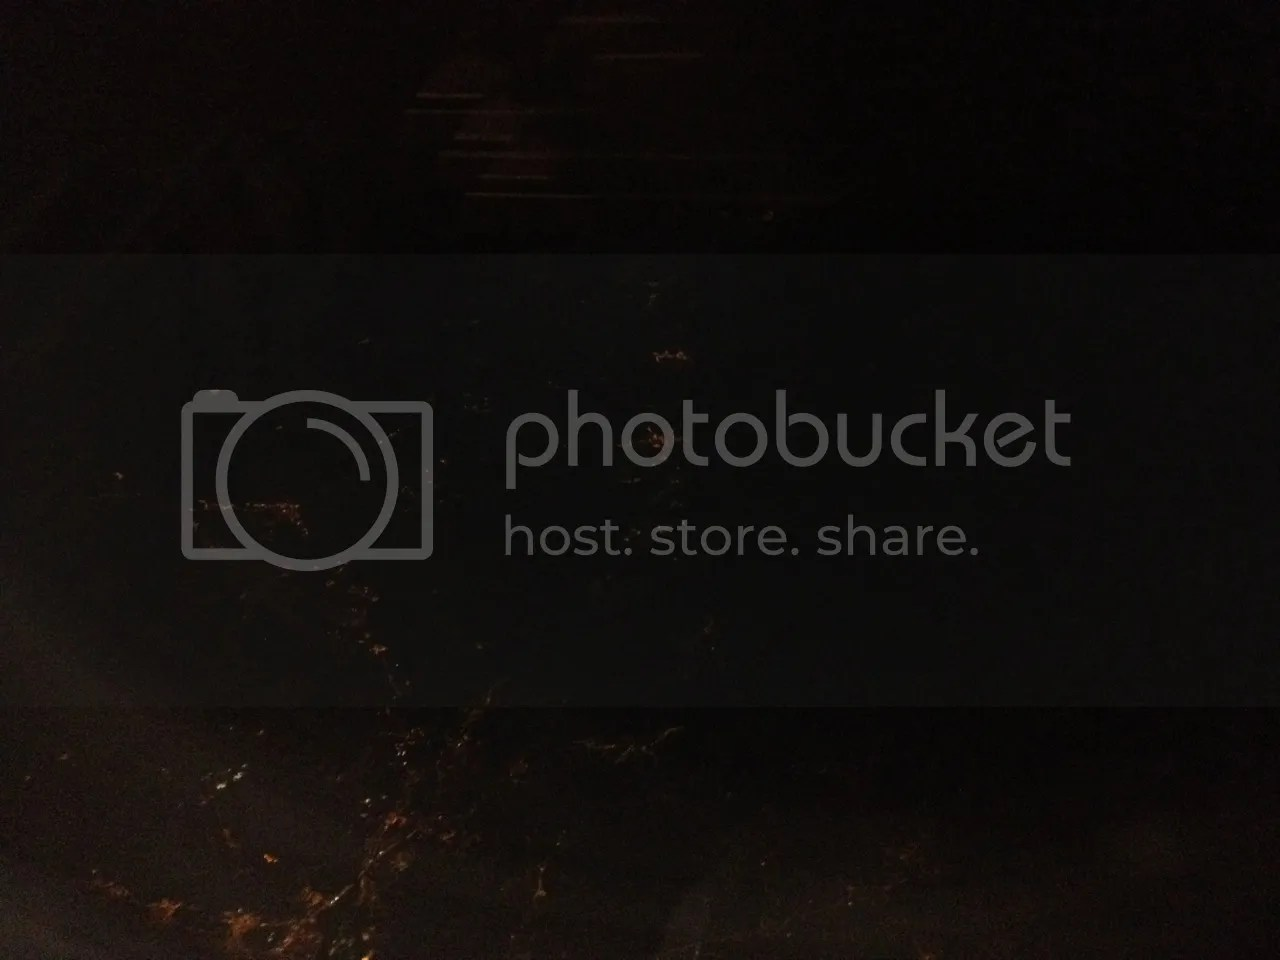 https://i2.wp.com/i181.photobucket.com/albums/x35/jwhite9185/Madrid/file-88.jpg